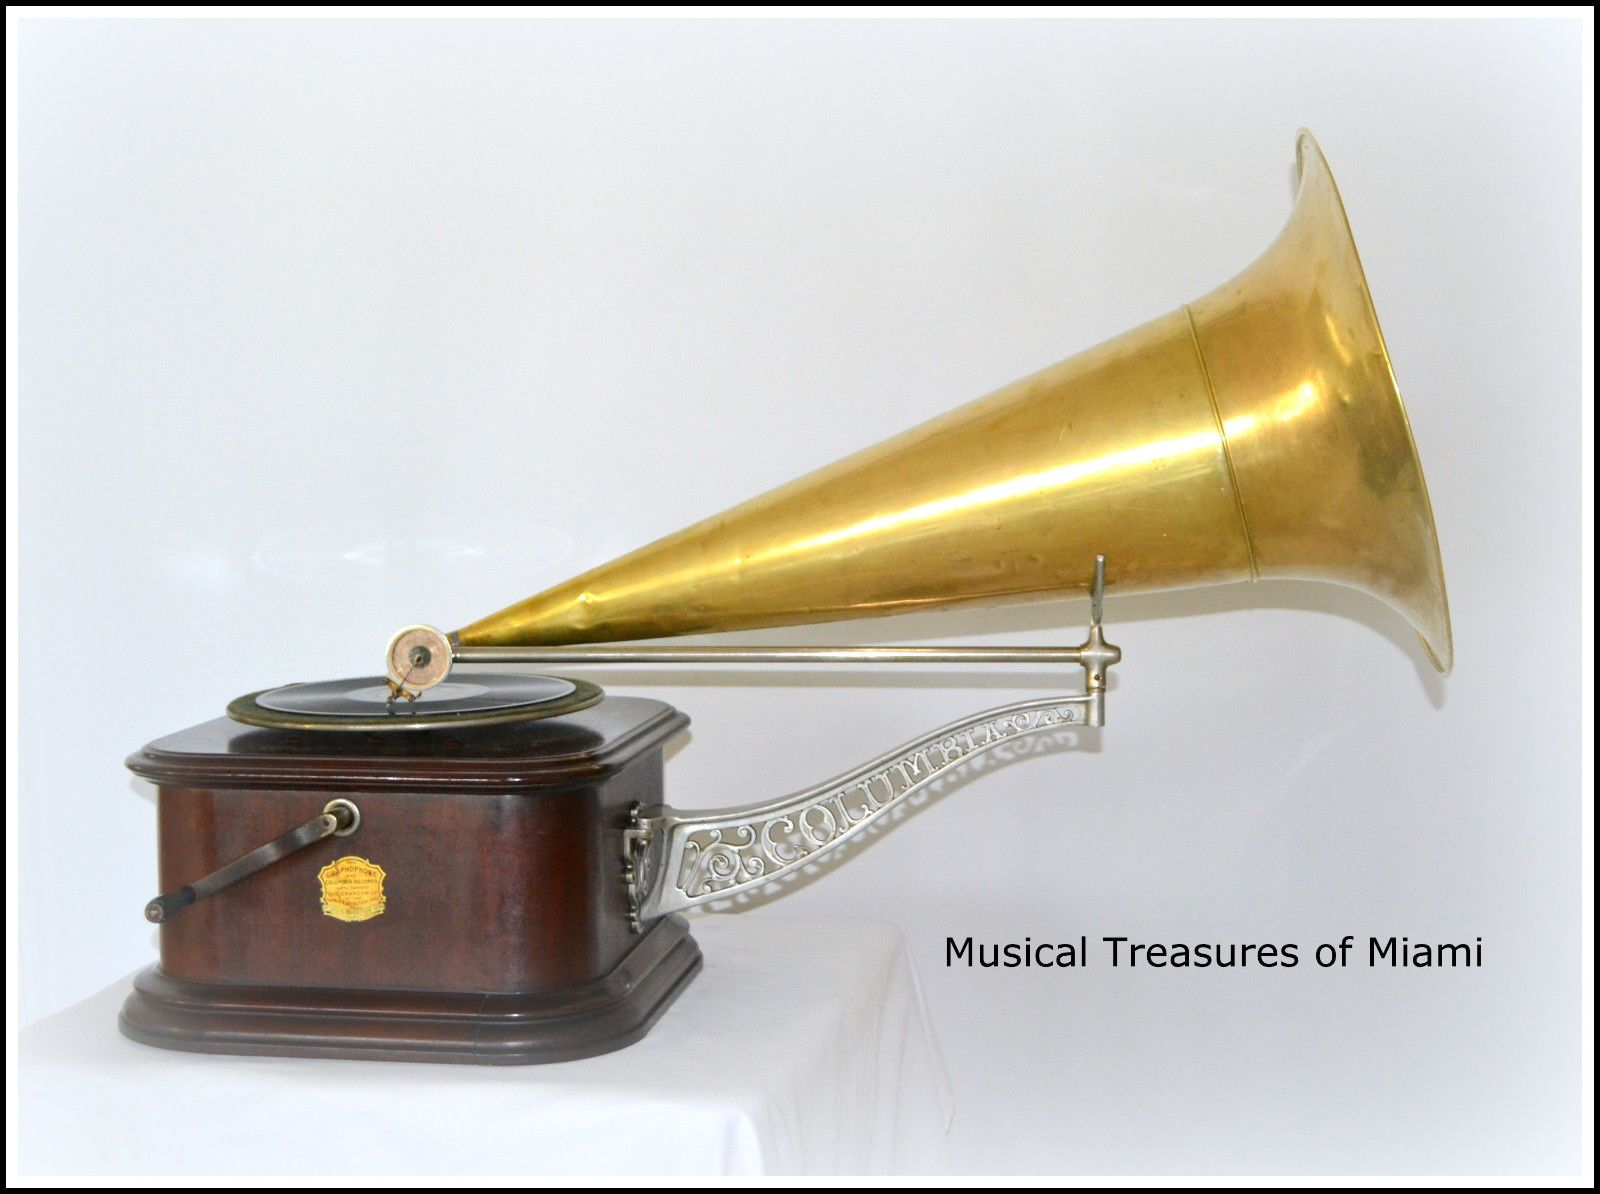 RARE COLUMBIA A-Y PHONOGRAPH GRAMOPHONE TALKING MACHINE | Collectibles, Radio, Phonograph, TV, Phone, Phonographs, Accessories | eBay!